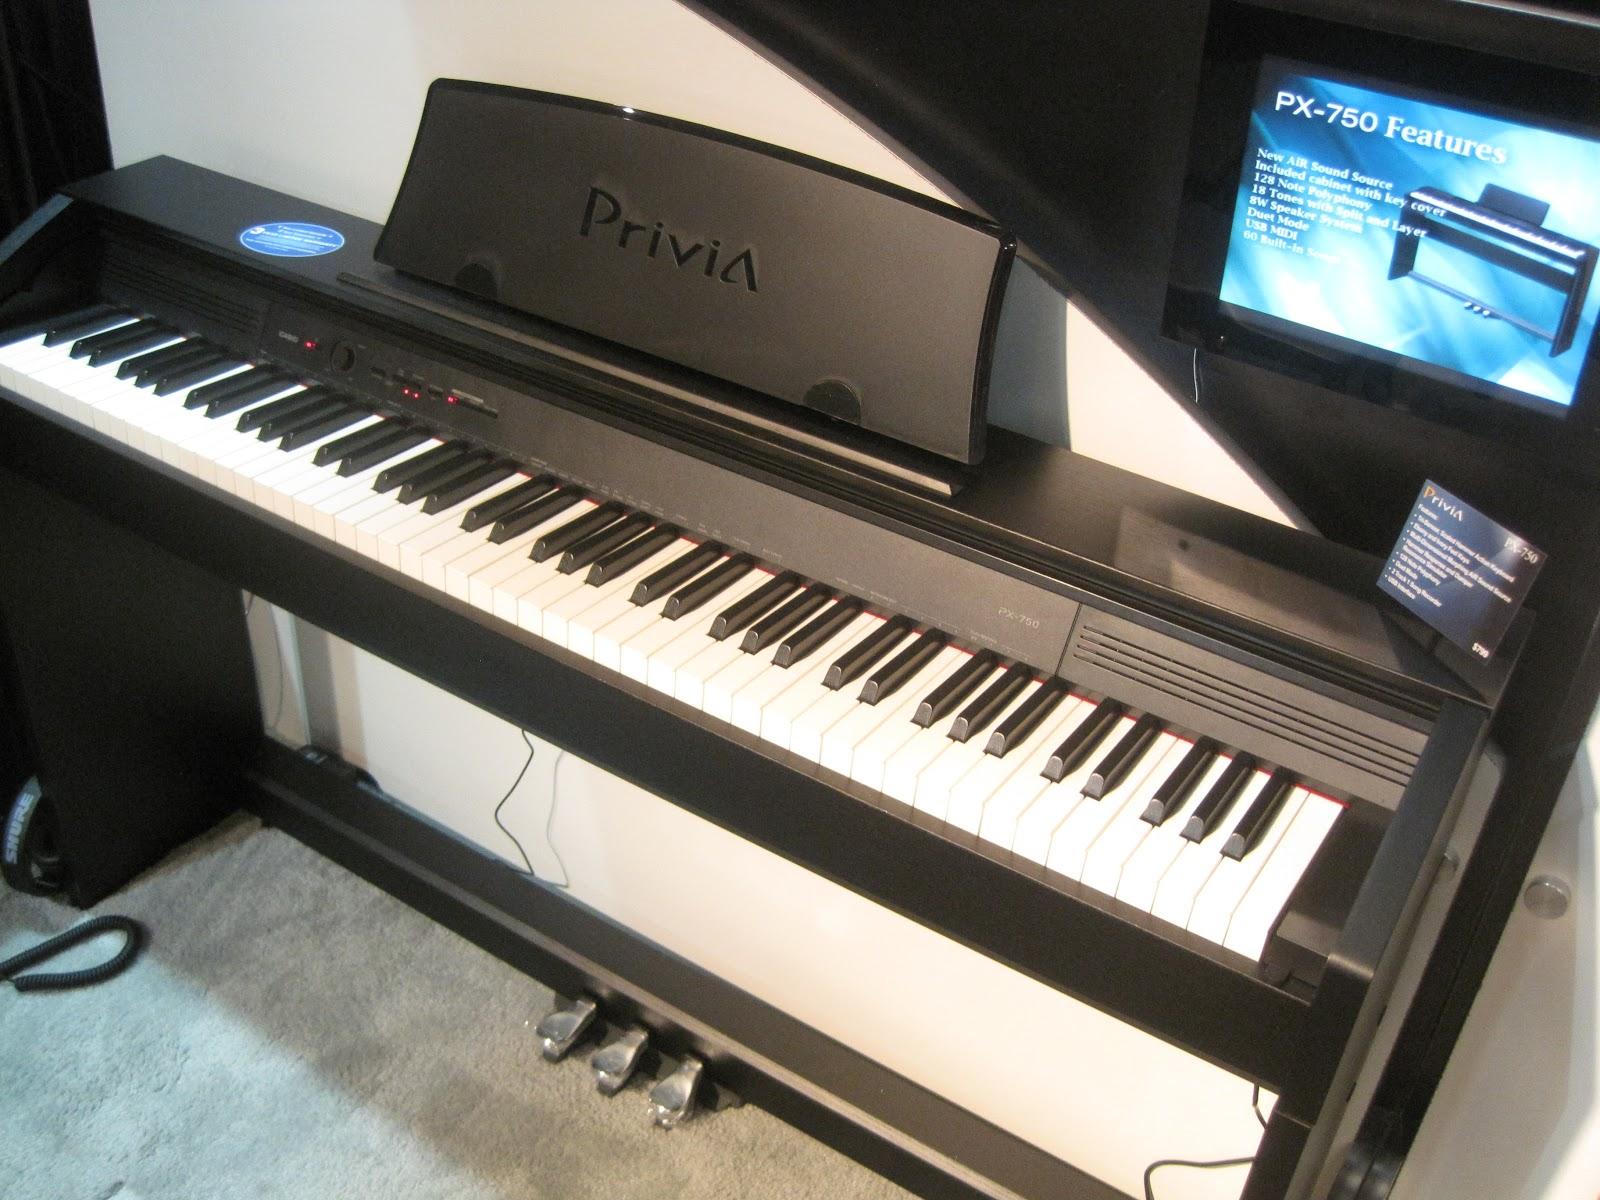 az piano reviews review yamaha p35 casio cdp120 casio cdp130 digital pianos under 500. Black Bedroom Furniture Sets. Home Design Ideas